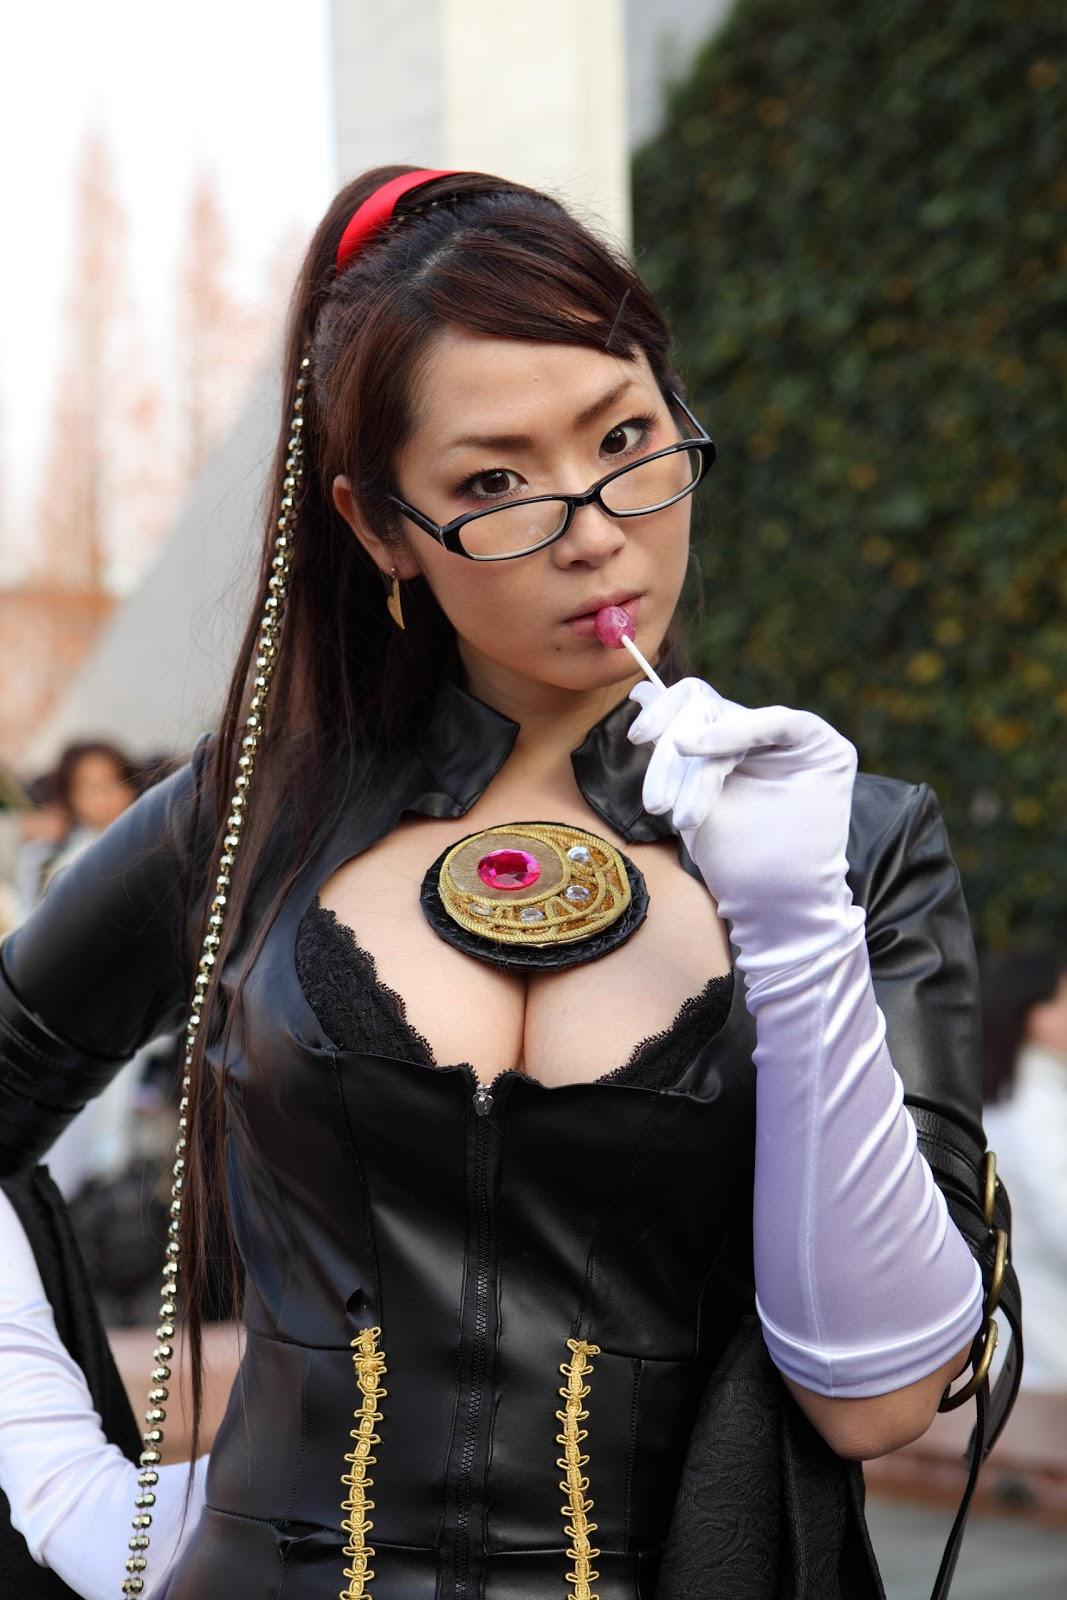 Comiket 88 Anime Cosplay Day 1 100